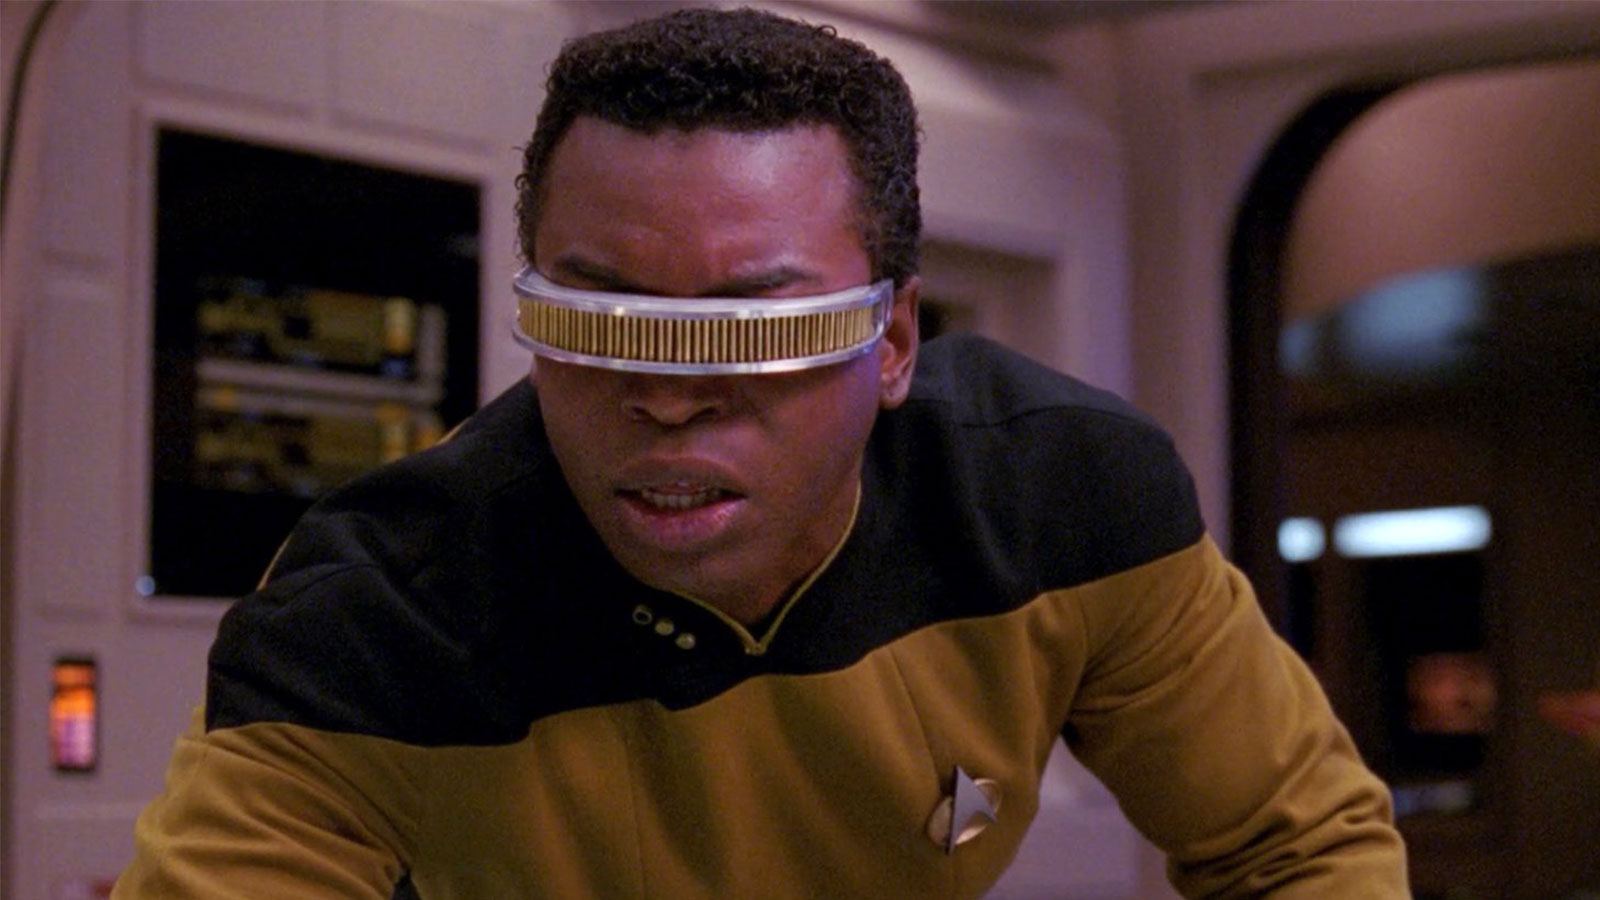 Fans Petition For Star Trek's LeVar Burton To Succeed Alex Trebek As Host Of Jeopardy